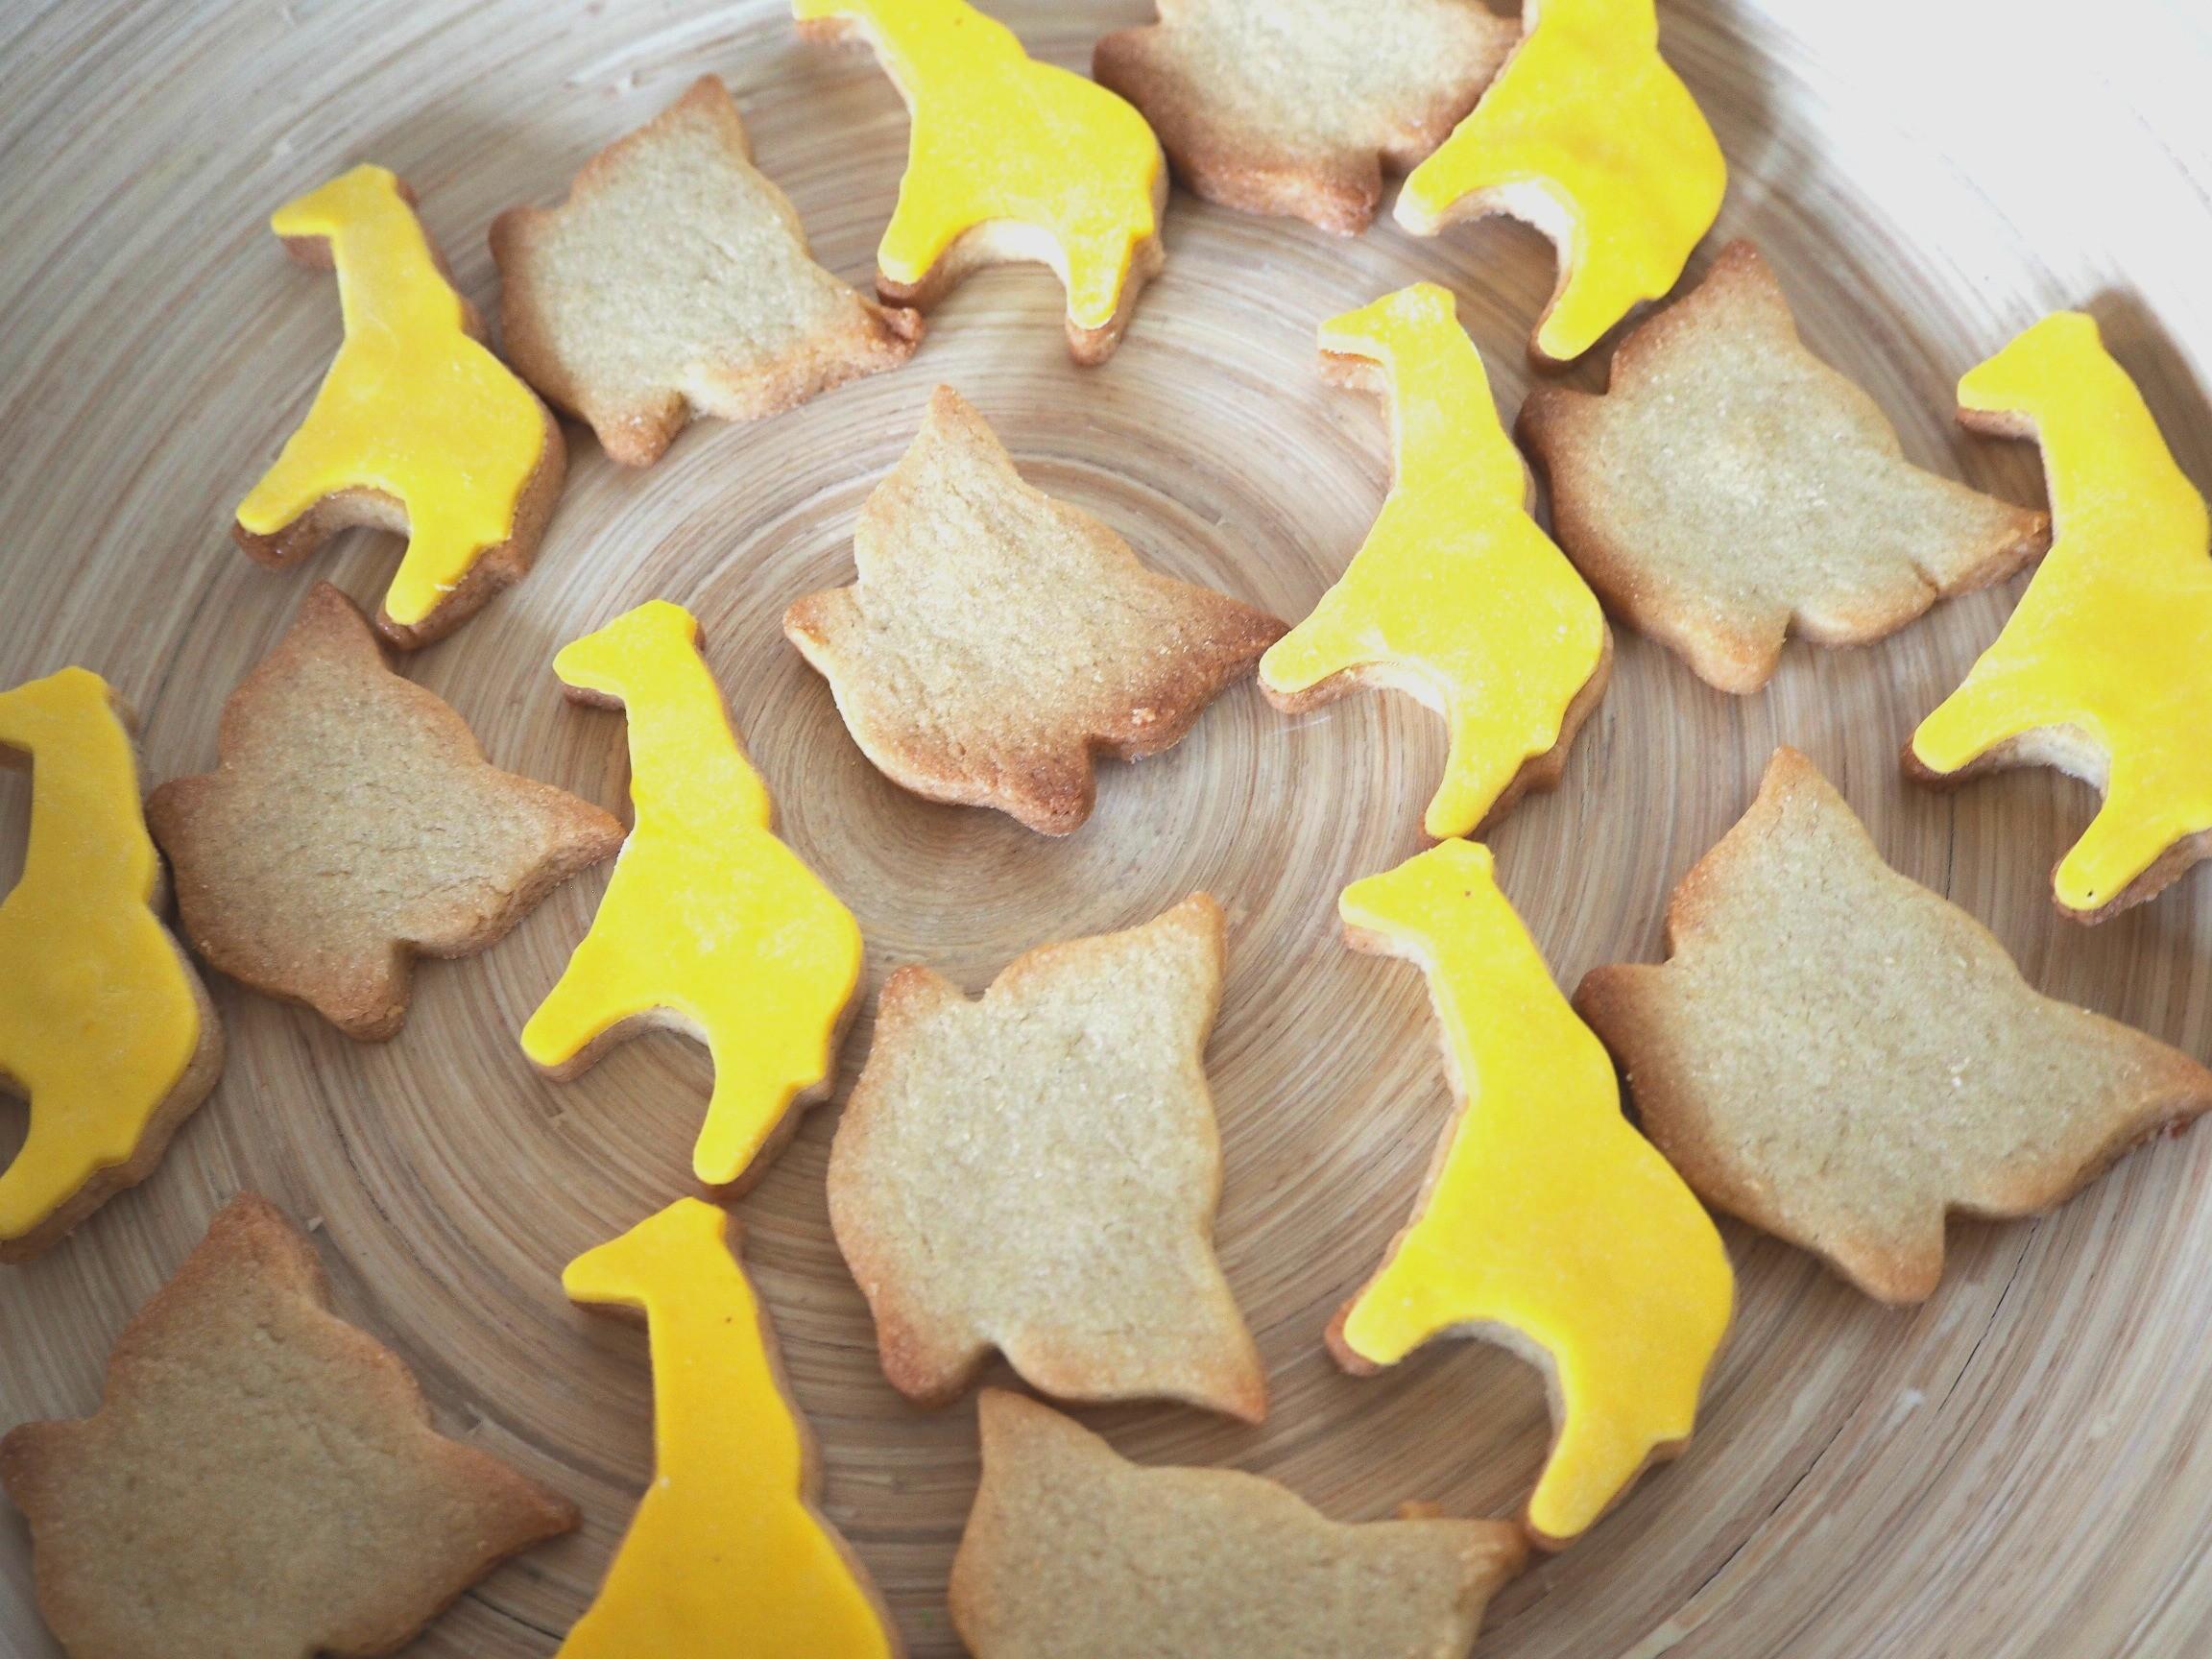 biscuits-decore-girafe-anniversaire-jungle-mumtobeparty